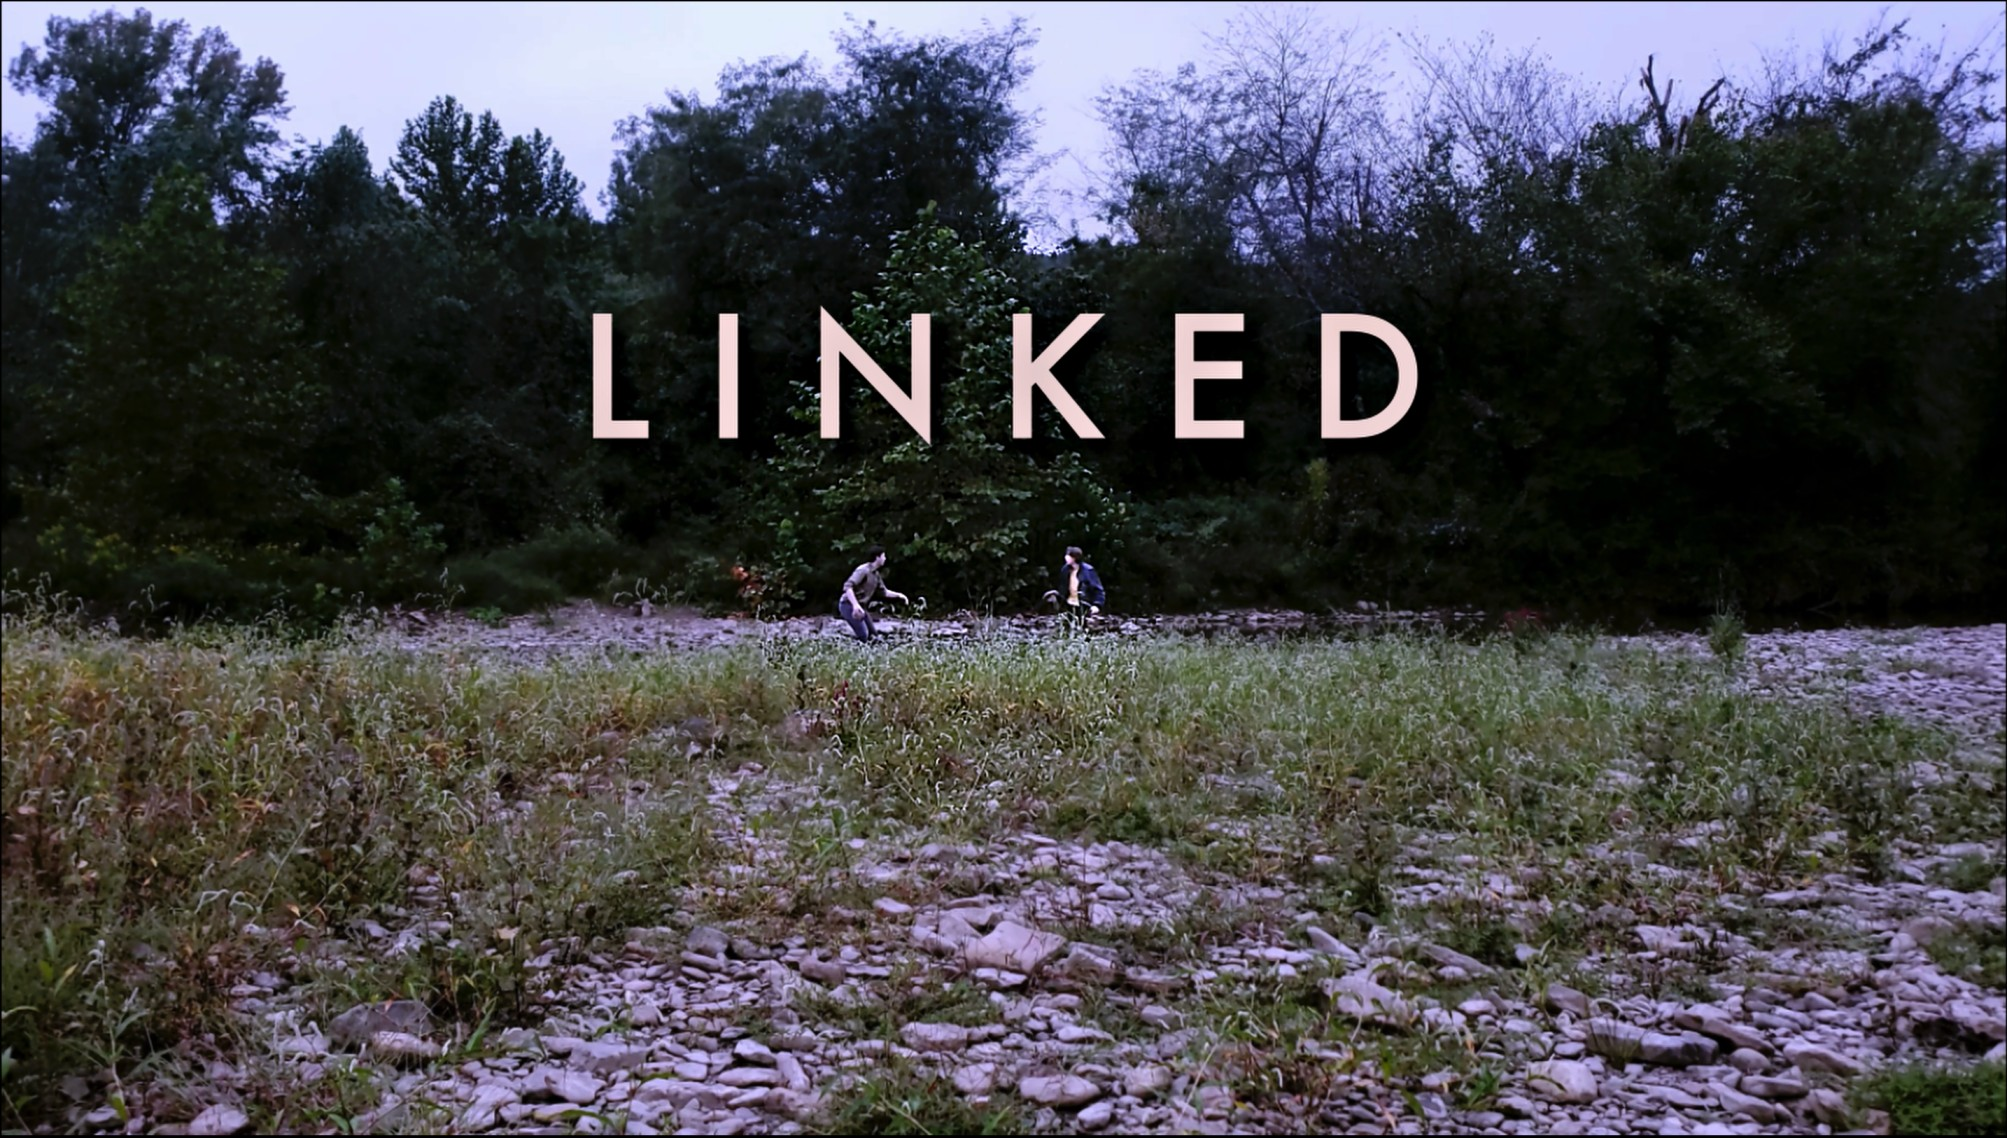 Linked - My RØDE Reel 2020